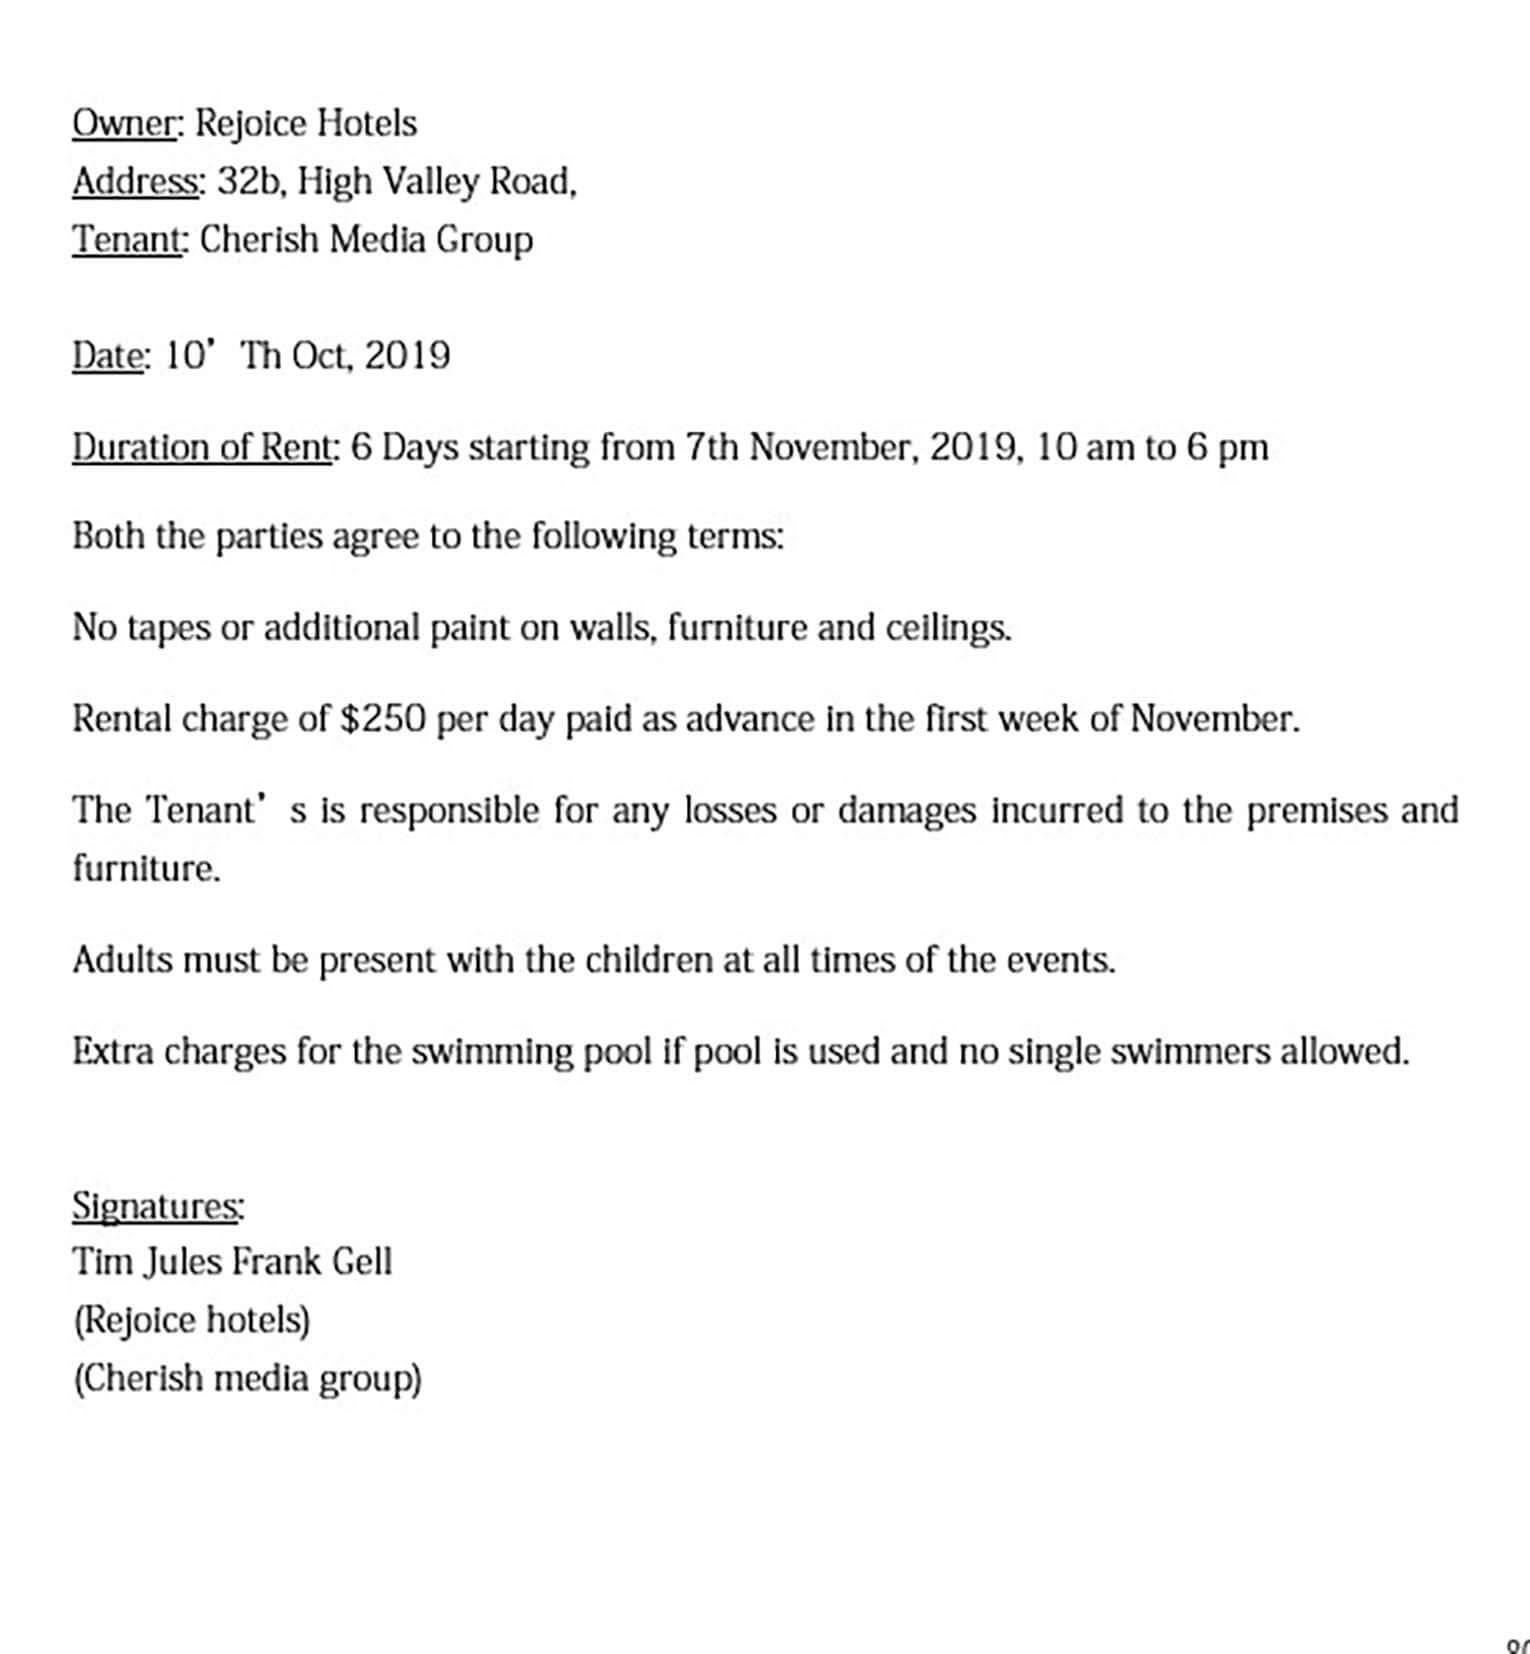 basic banquet room rental agreement